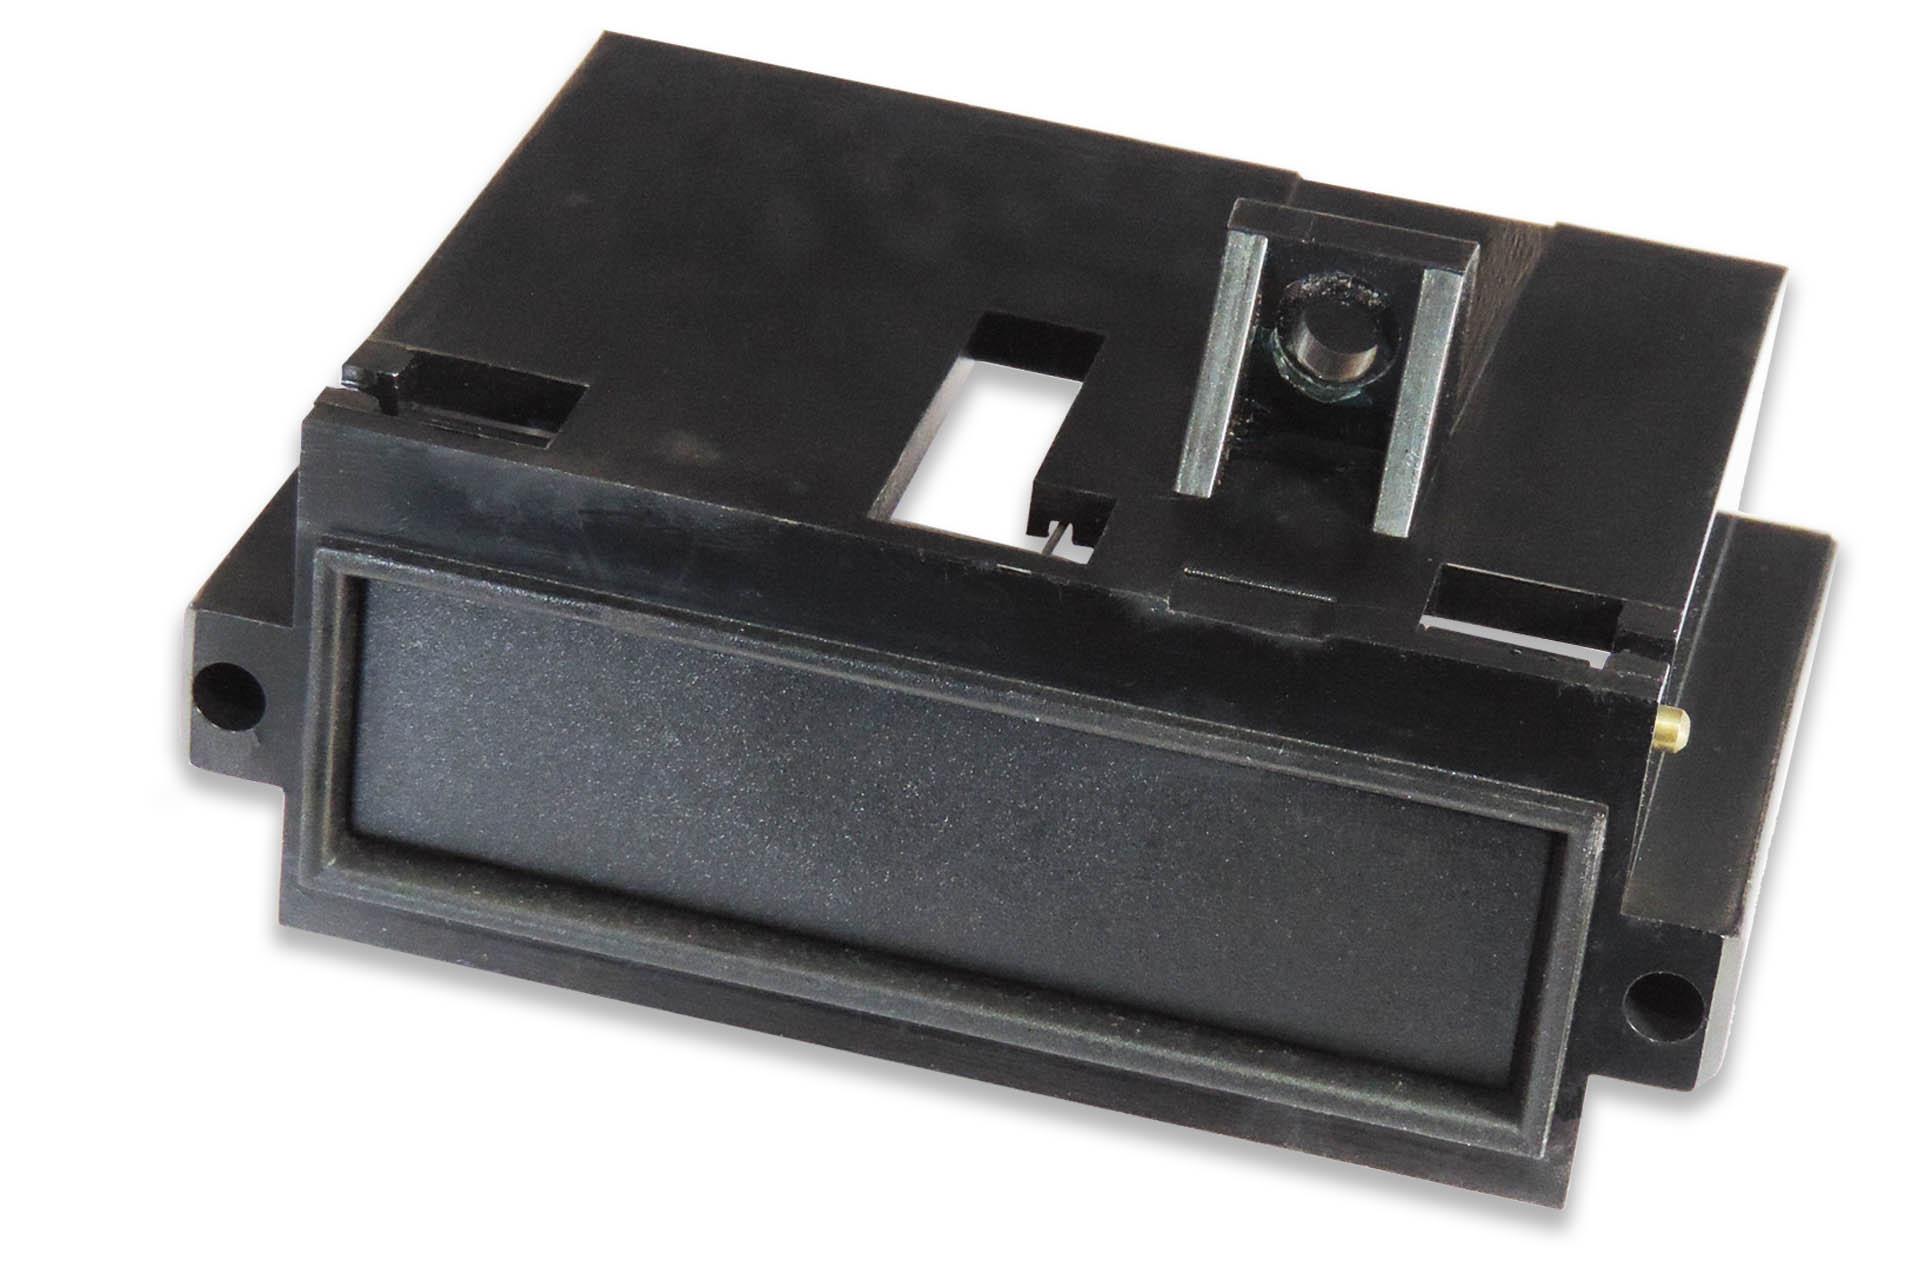 MKS-80 Data Cartridge Slot Front Assembly